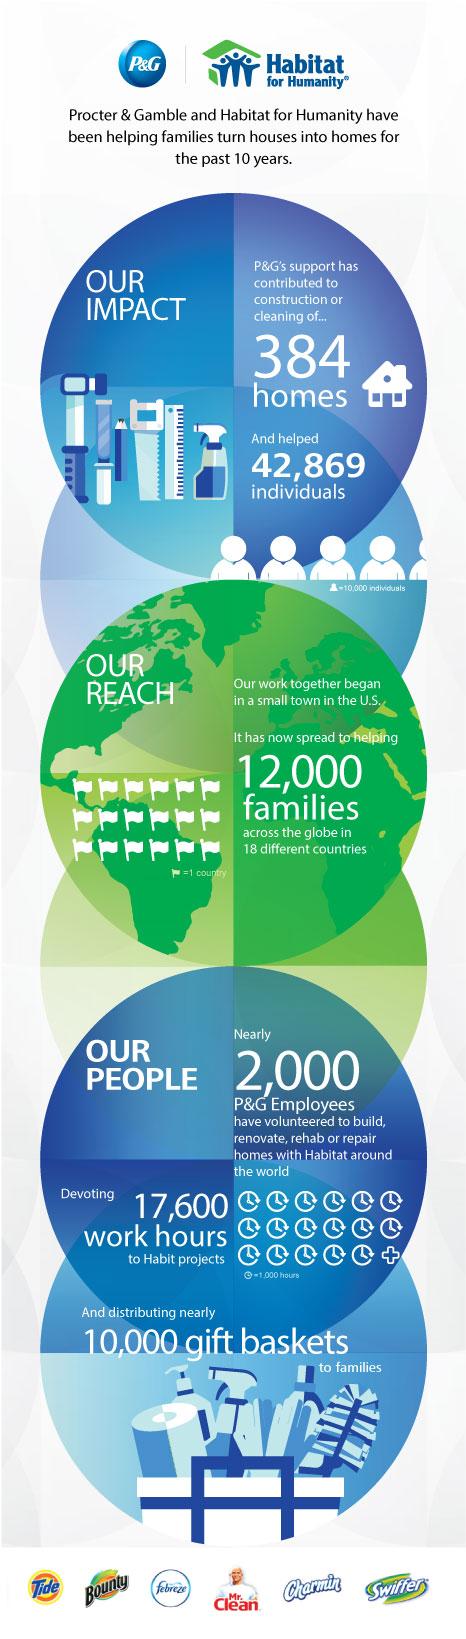 Habitat Infographic thumb